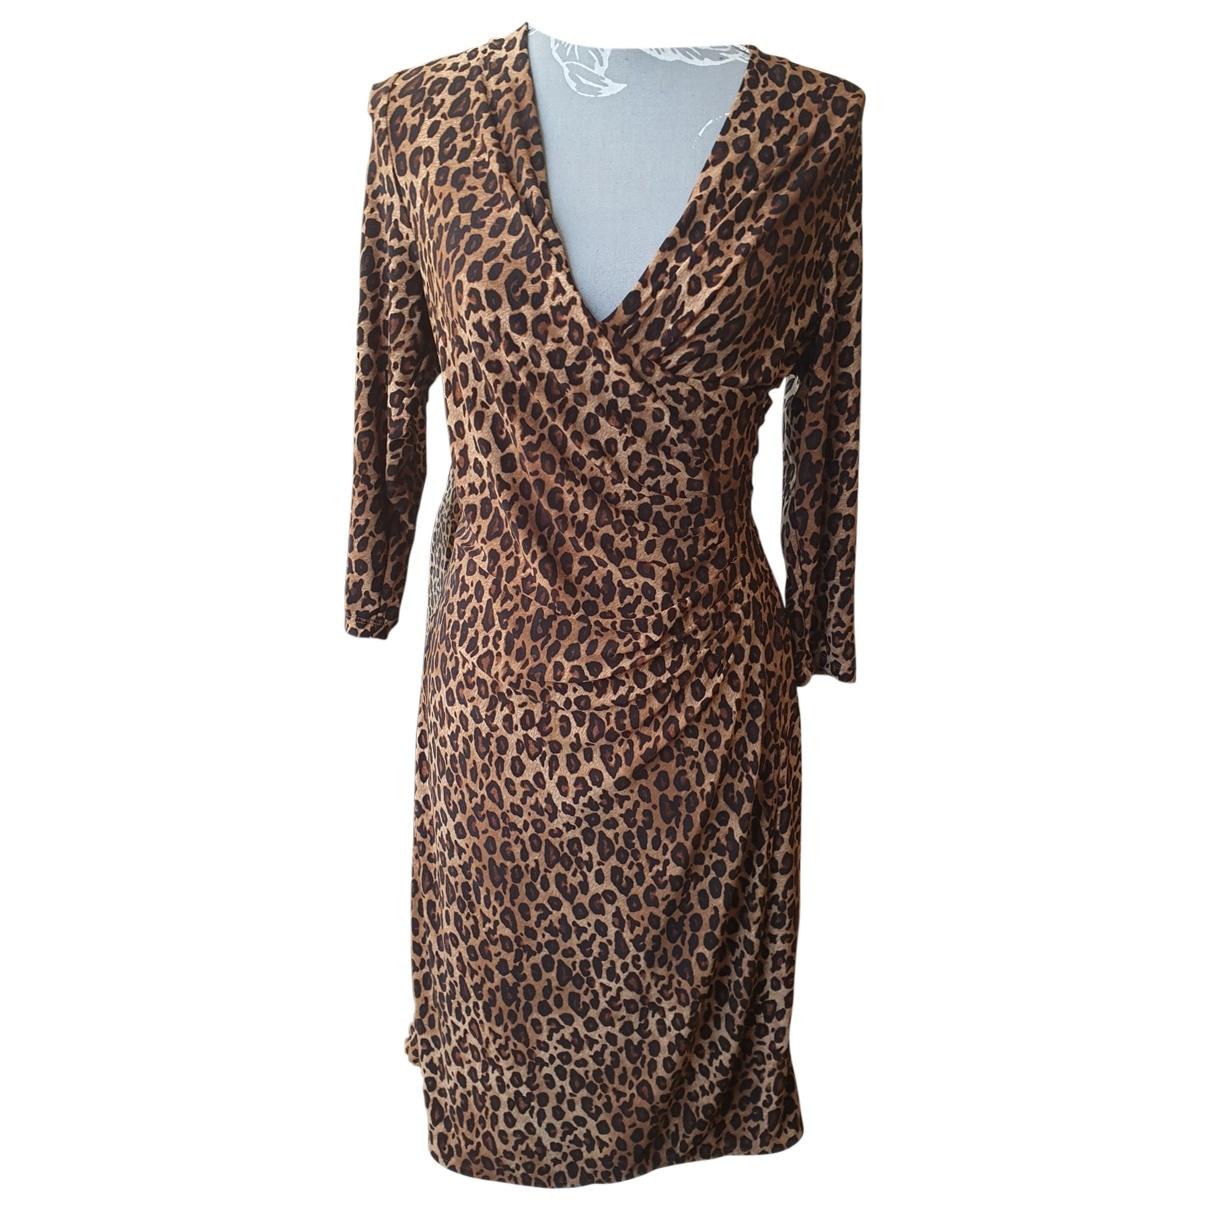 Lauren Ralph Lauren \N Multicolour Cotton - elasthane dress for Women 10 UK